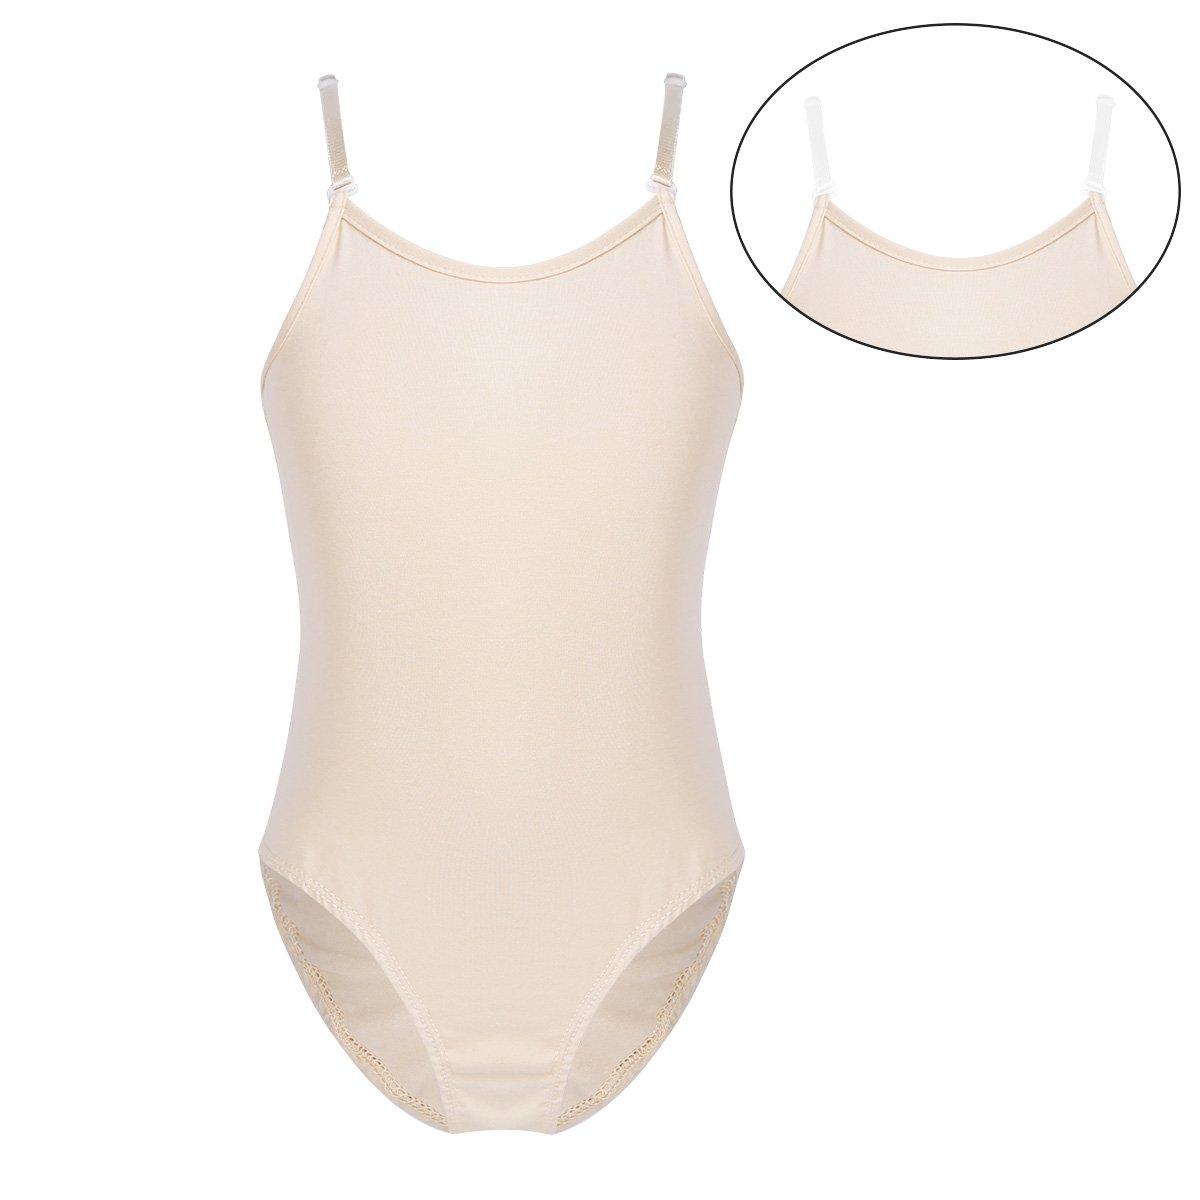 iEFiEL Girls Little Ballerina Dancer Balletドレススカートレオタードジムダンス用 B07FQQQ8L7 10-12 肌色 肌色 43750